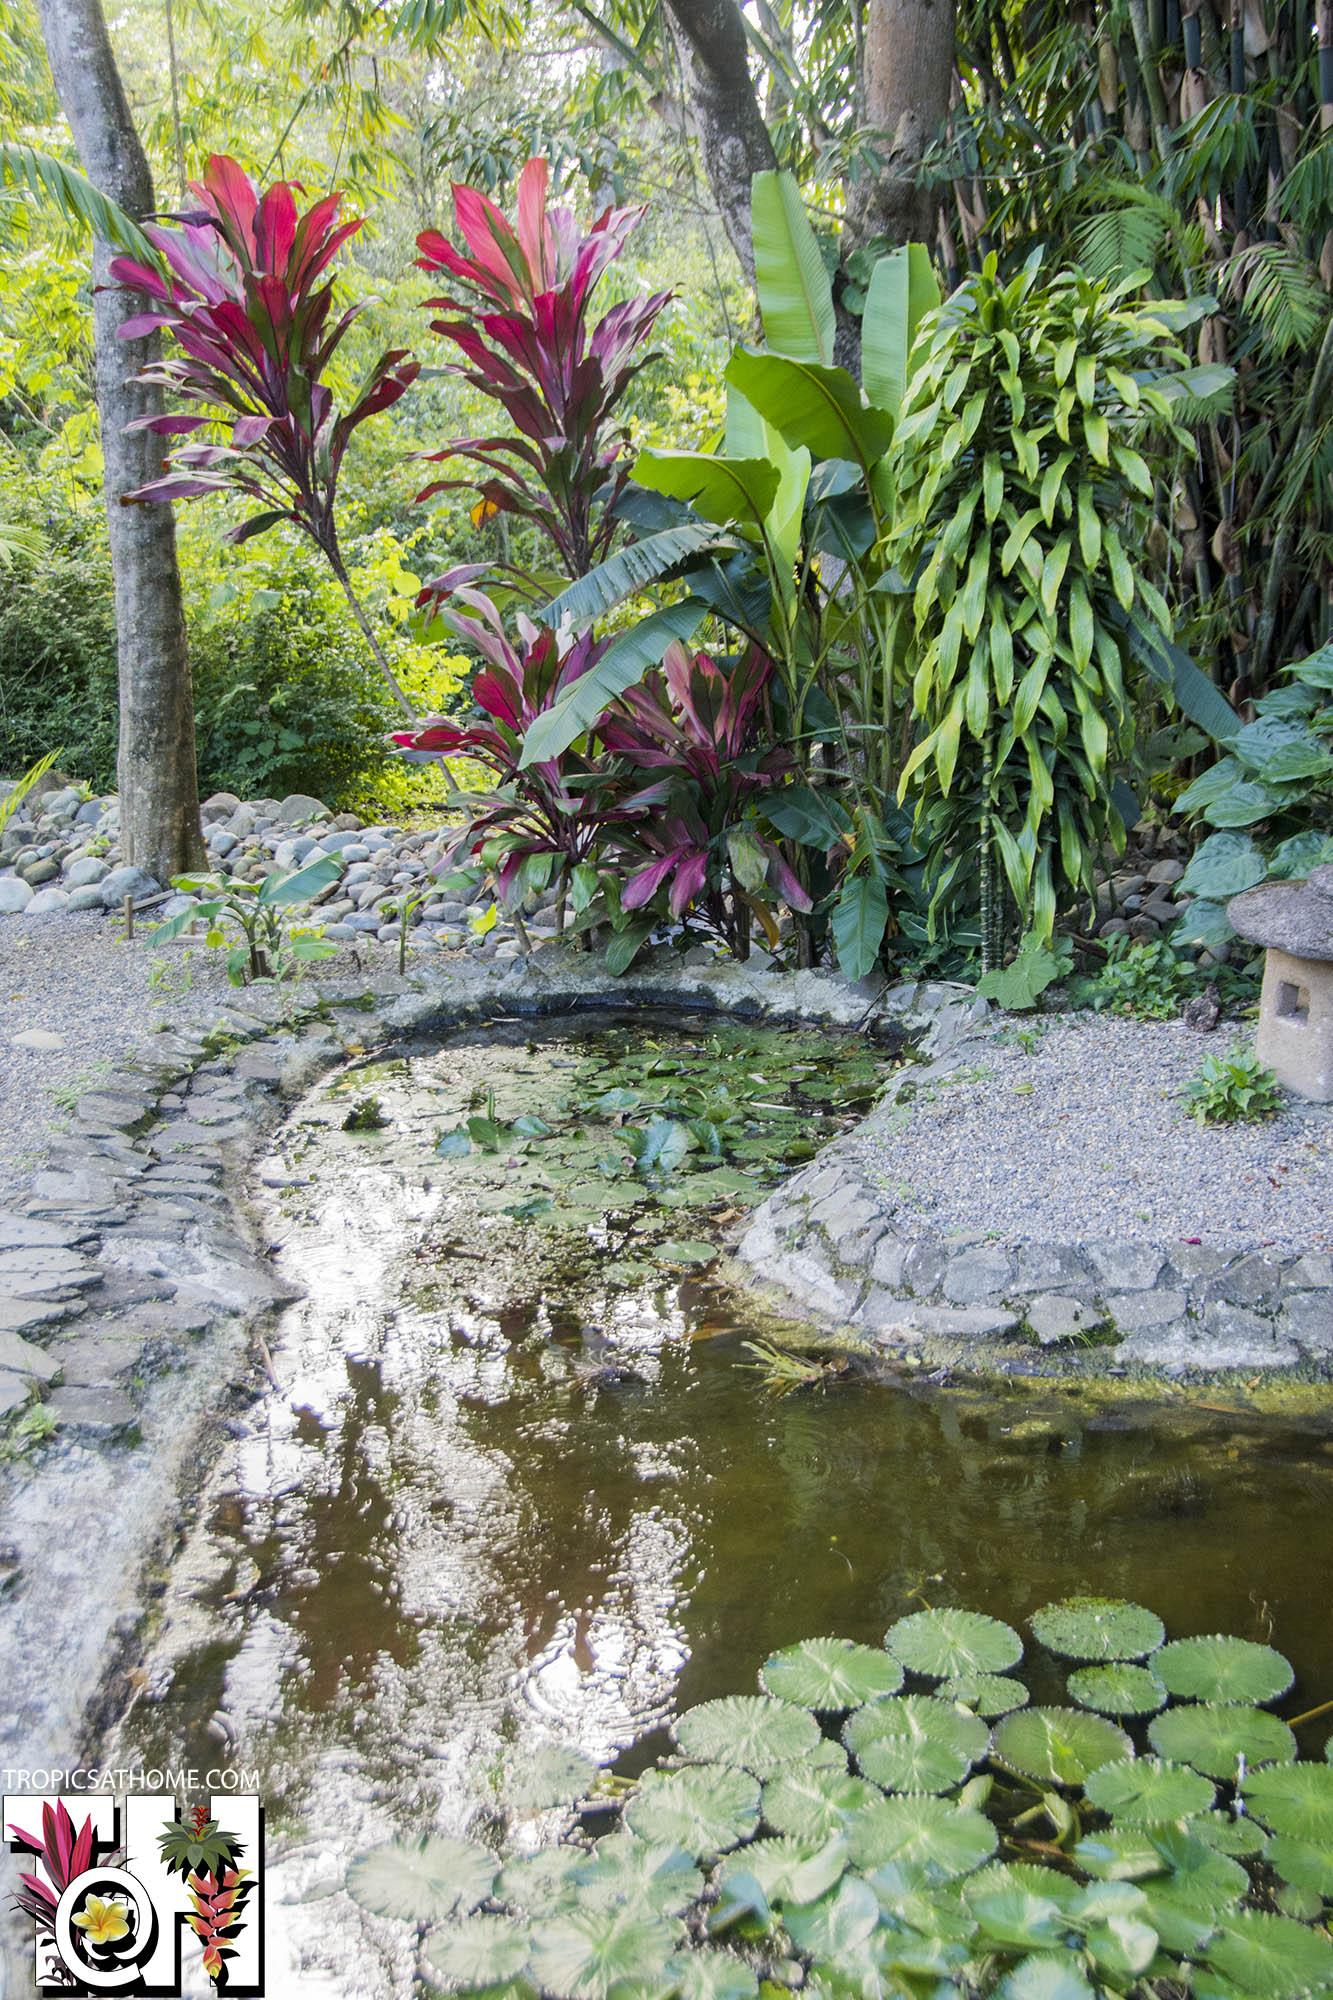 Lankester Botanical Garden Costa Rica Tropics Home